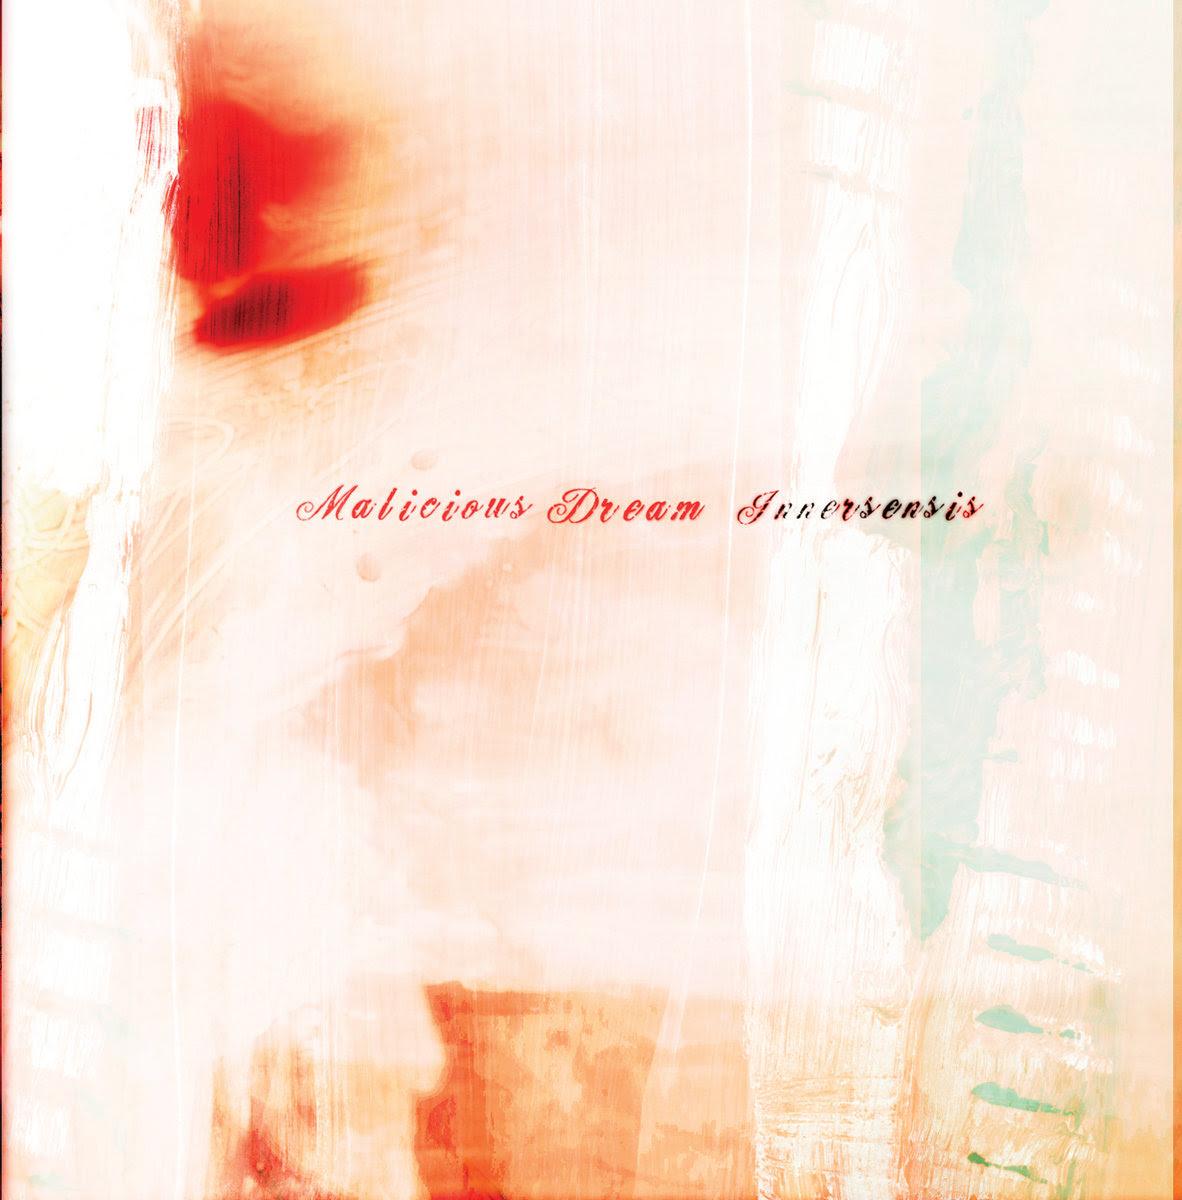 Malicious Dream - Innersensis (EP 2006)